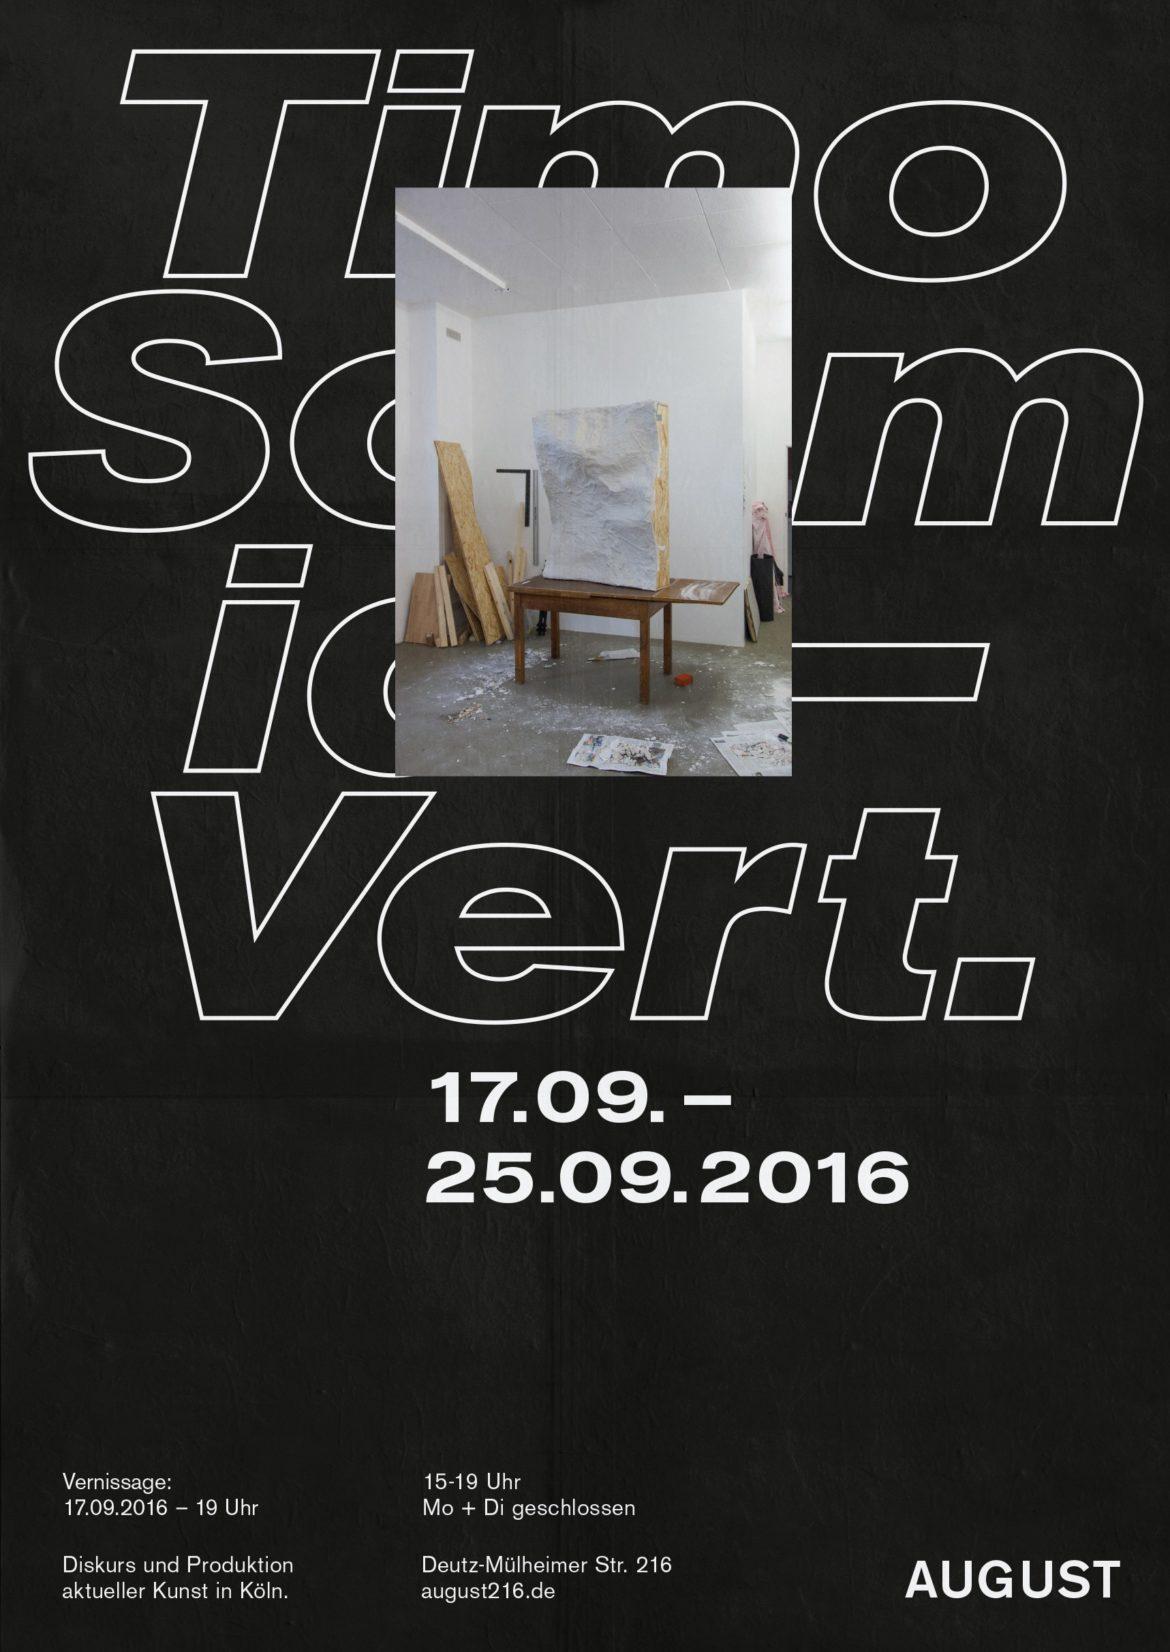 Timo Schmidt   Plakat  Design   Schrift  Schwarz